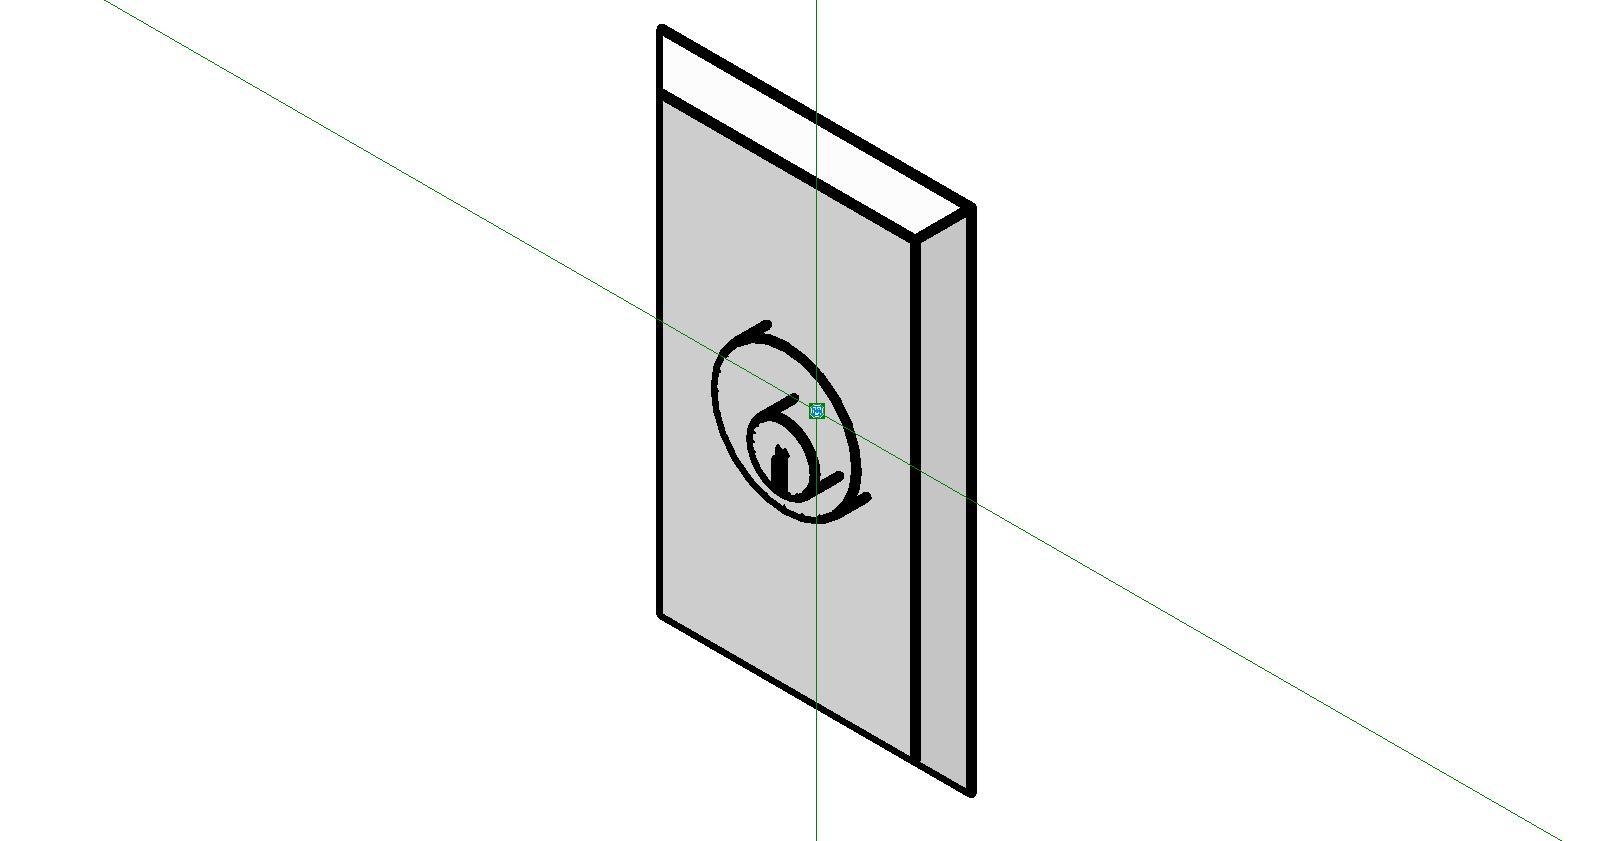 Door Hardware Security Keyswitch - 650 Series  sc 1 st  BIM Objects / Families & BIM Objects / Families